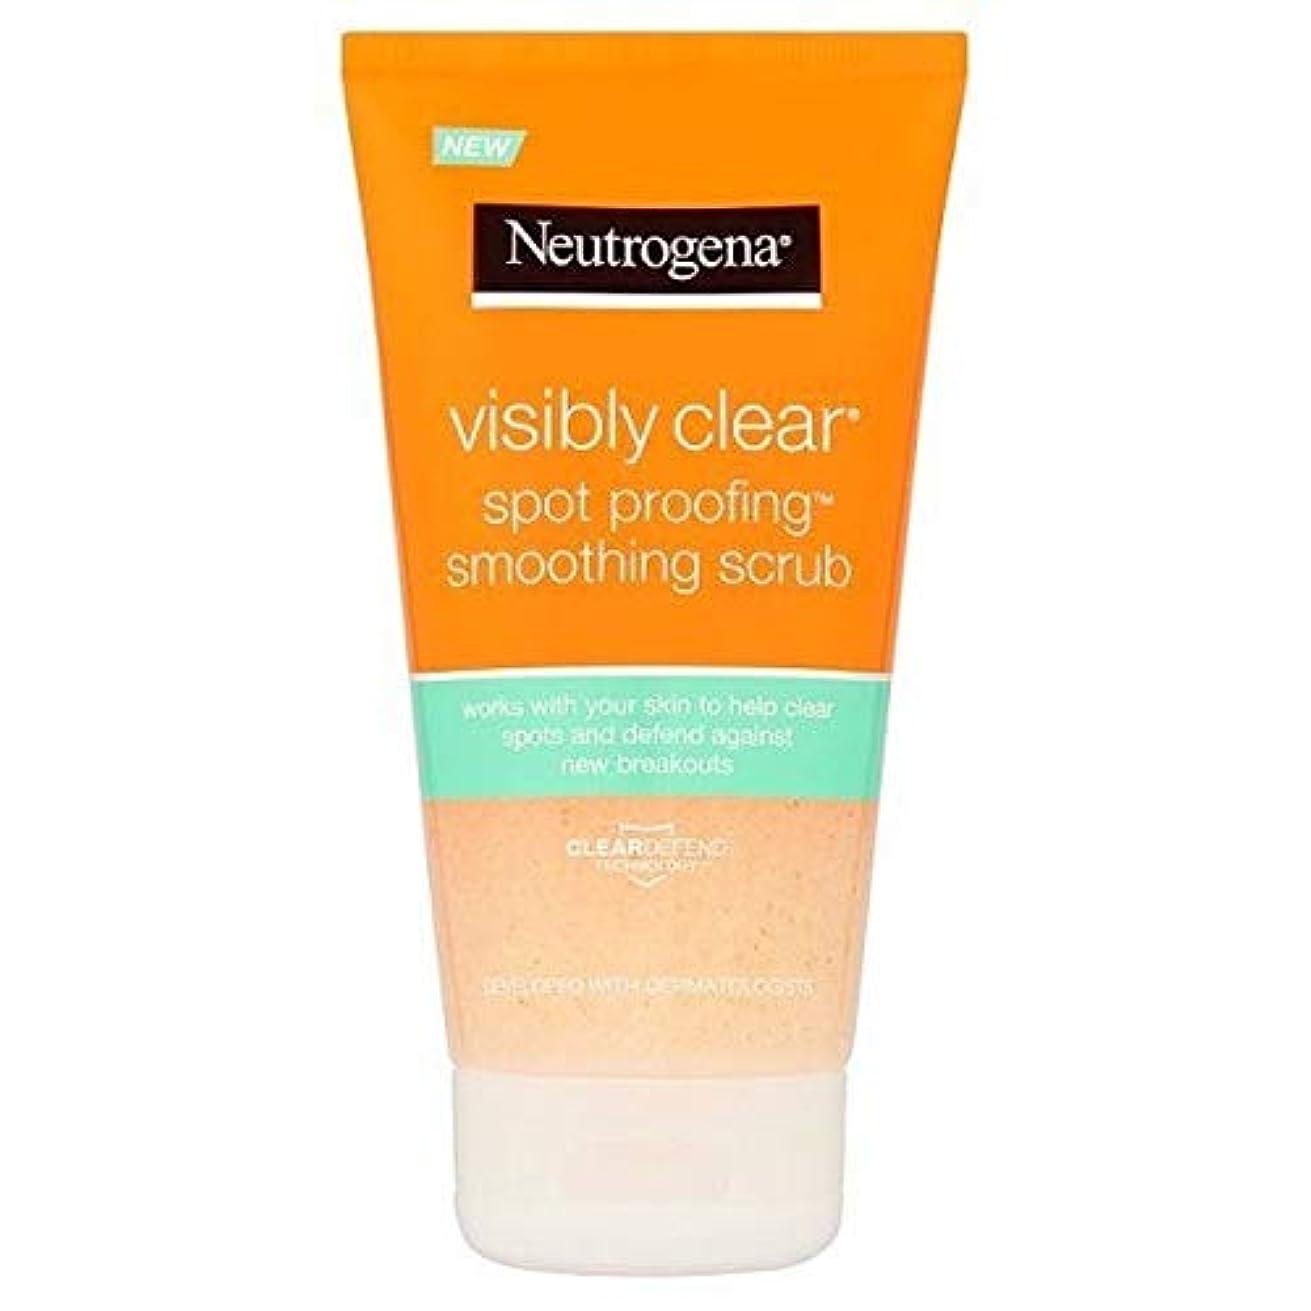 [Neutrogena ] ニュートロジーナ目に見えて明らかスポットプルーフスムージングスクラブ150ミリリットル - Neutrogena Visibly Clear Spot Proofing Smoothing Scrub...